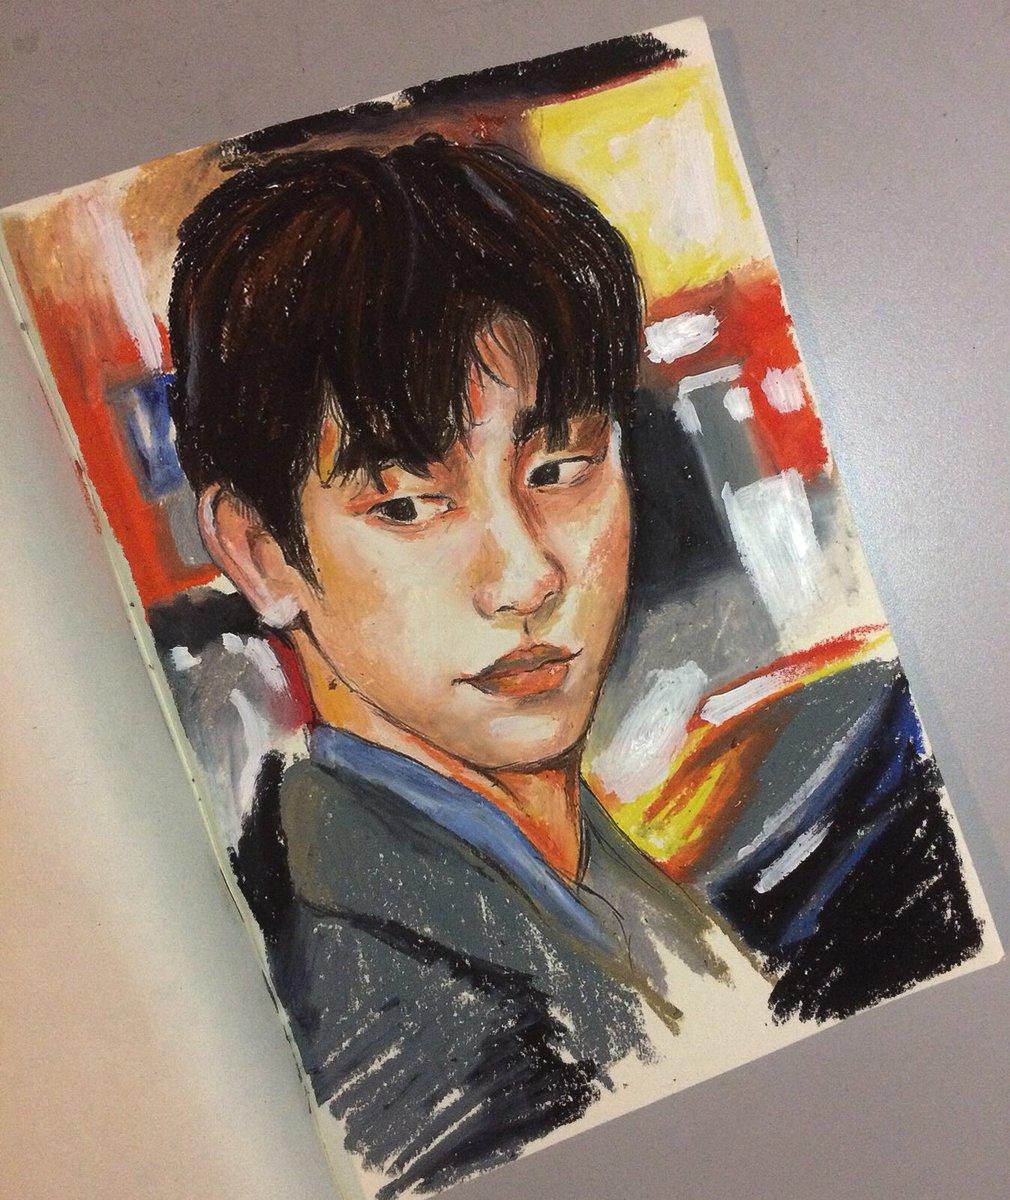 I MISS YOU......I'M SORRY.  #jinyoung #got7 #igot7 #got7fanart #hear_here #art #artwork #painting #drawingpic.twitter.com/AkpXLbehp5